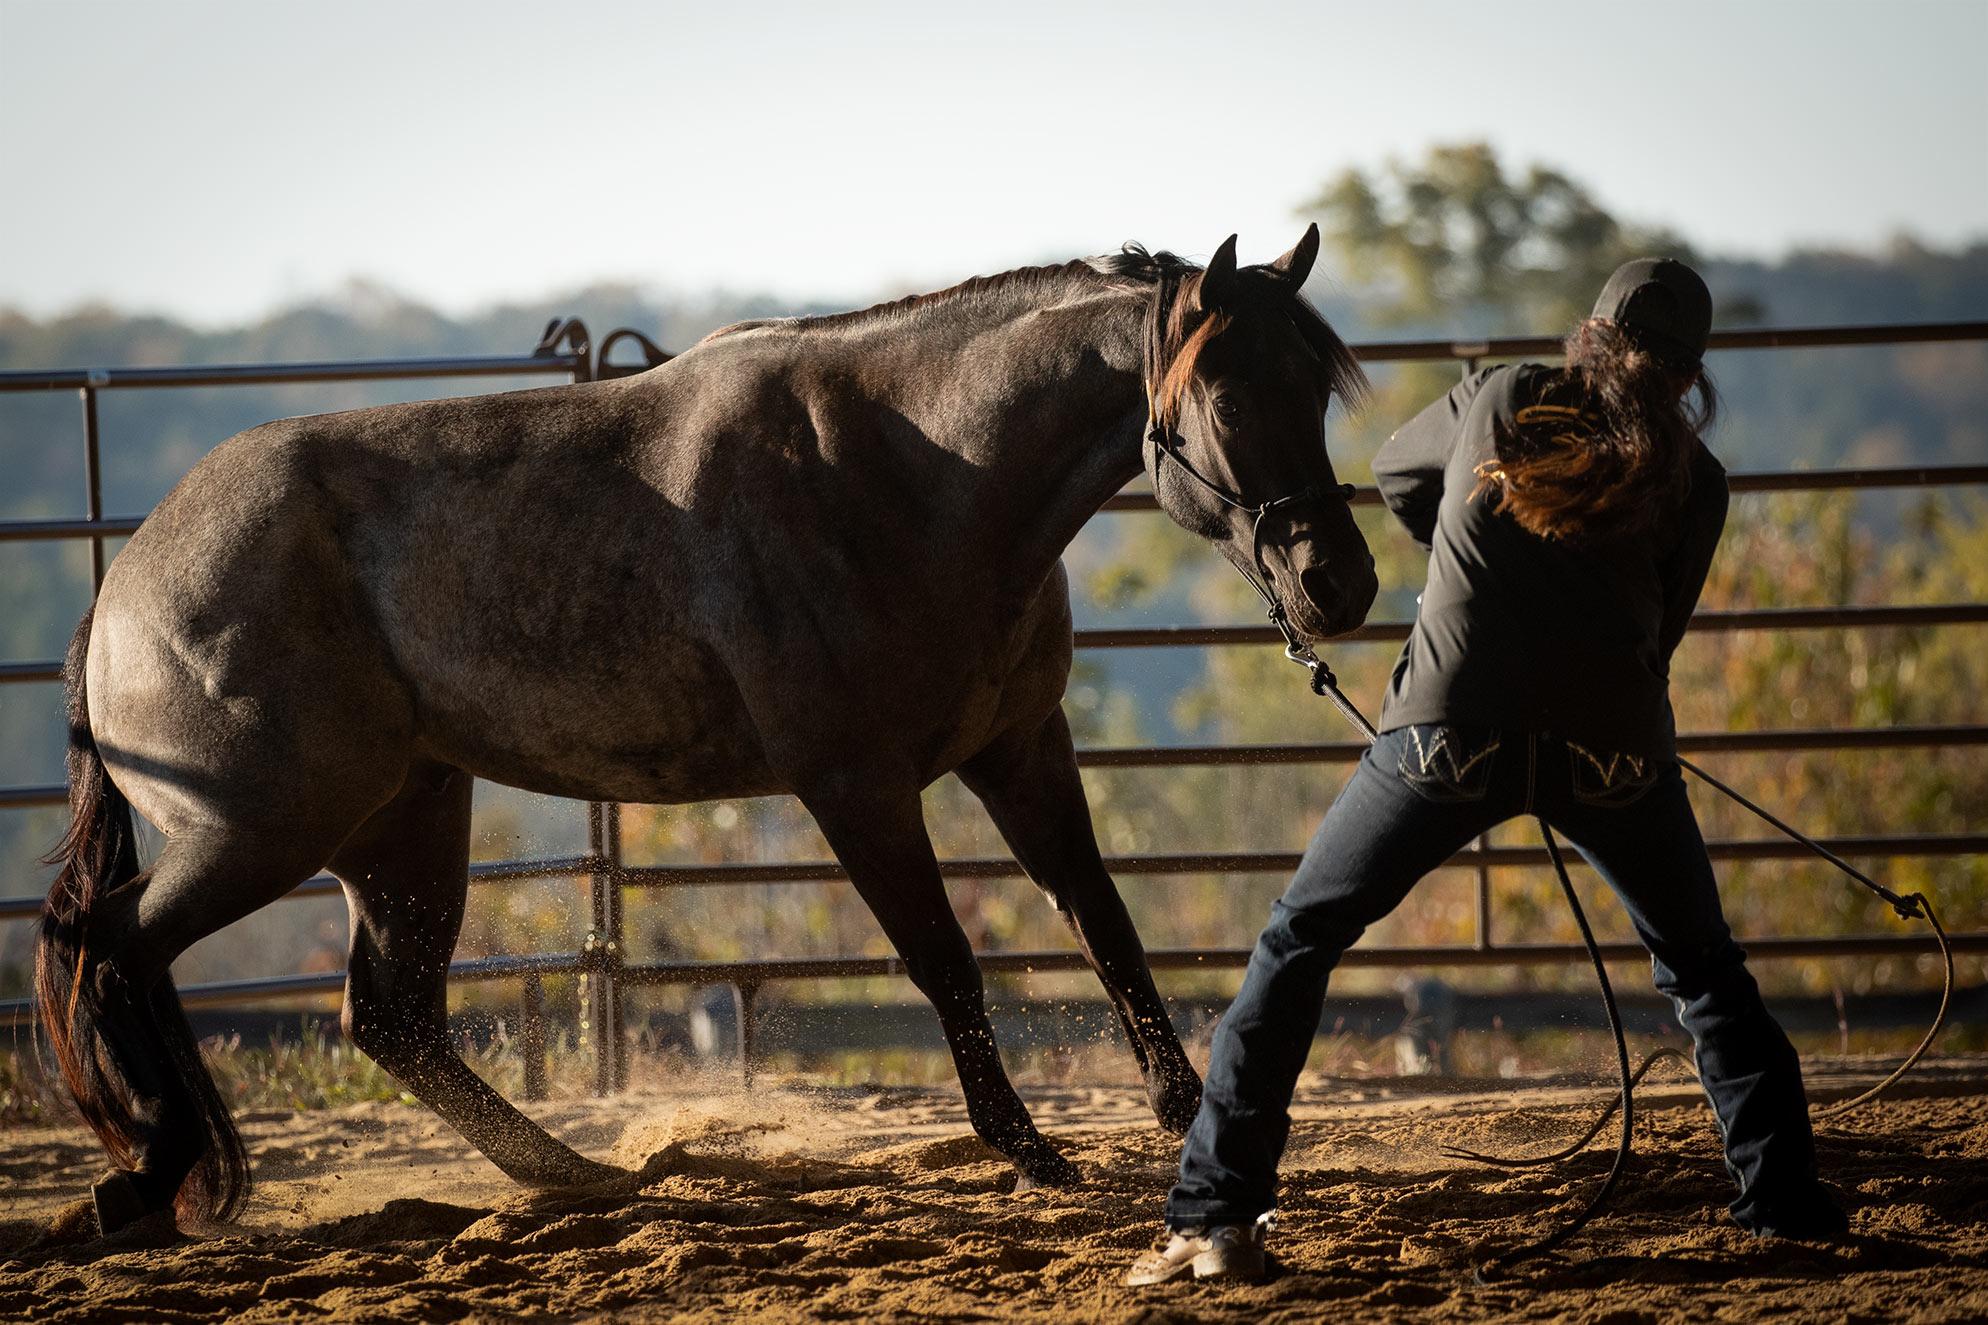 027-Gunsmoke-Luxury-Trail-Horse-For-Sale